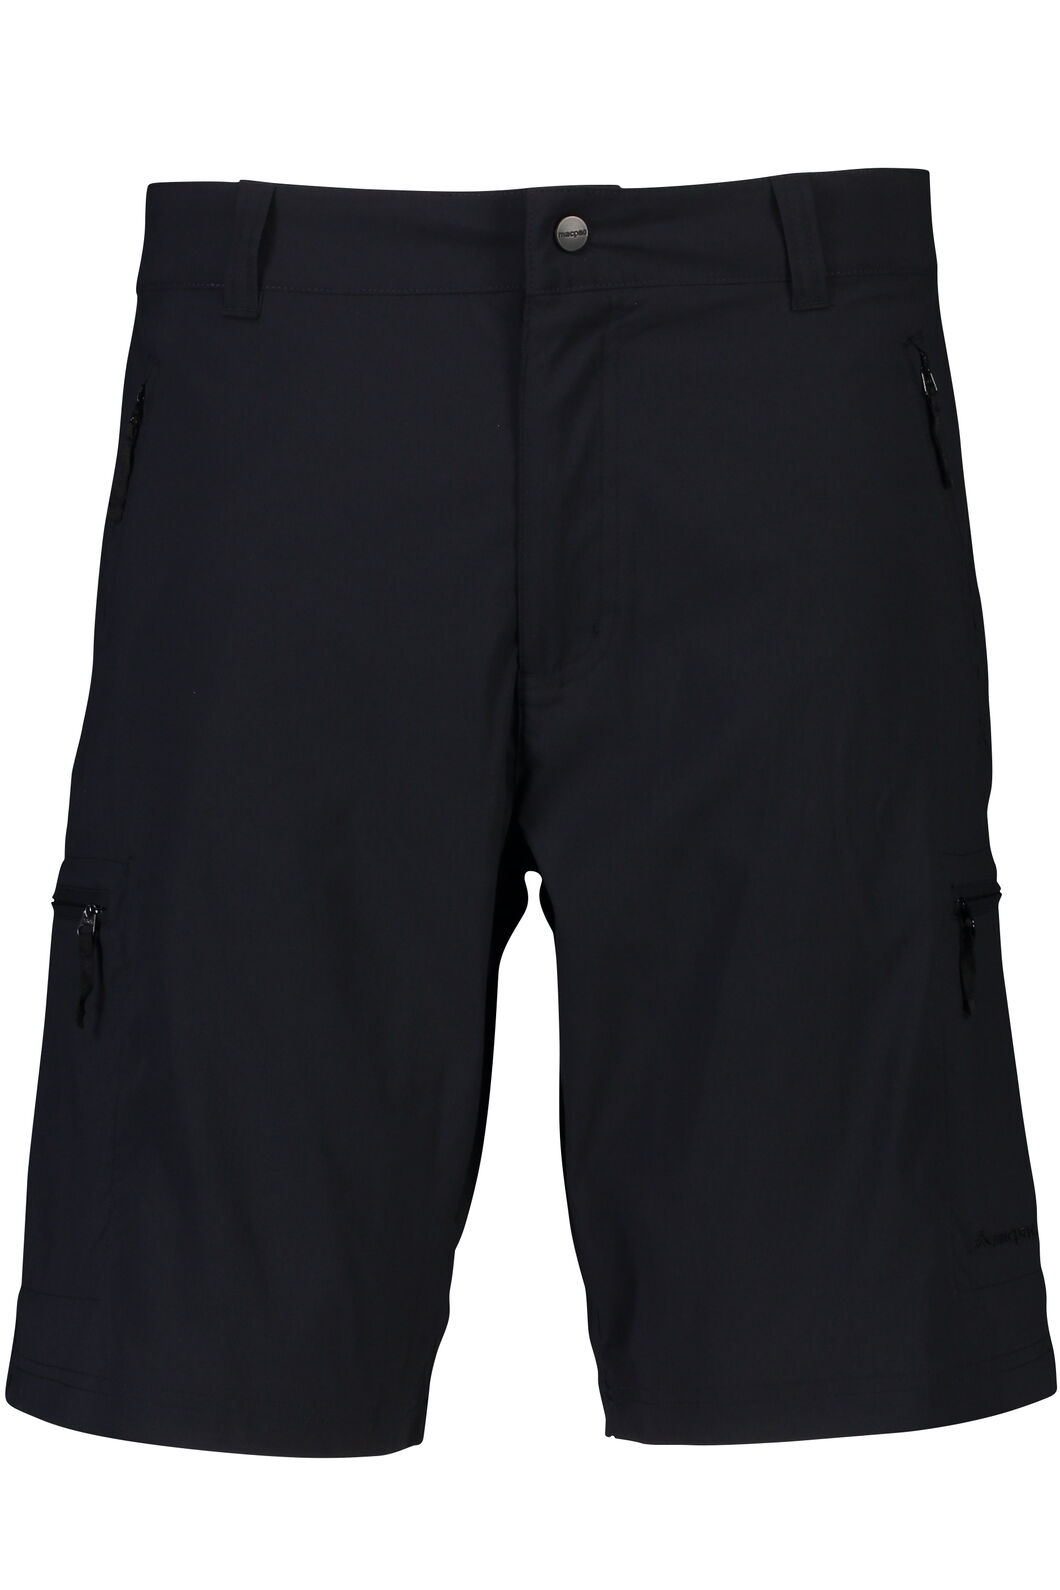 Macpac Drift Shorts - Men's, Anthracite, hi-res